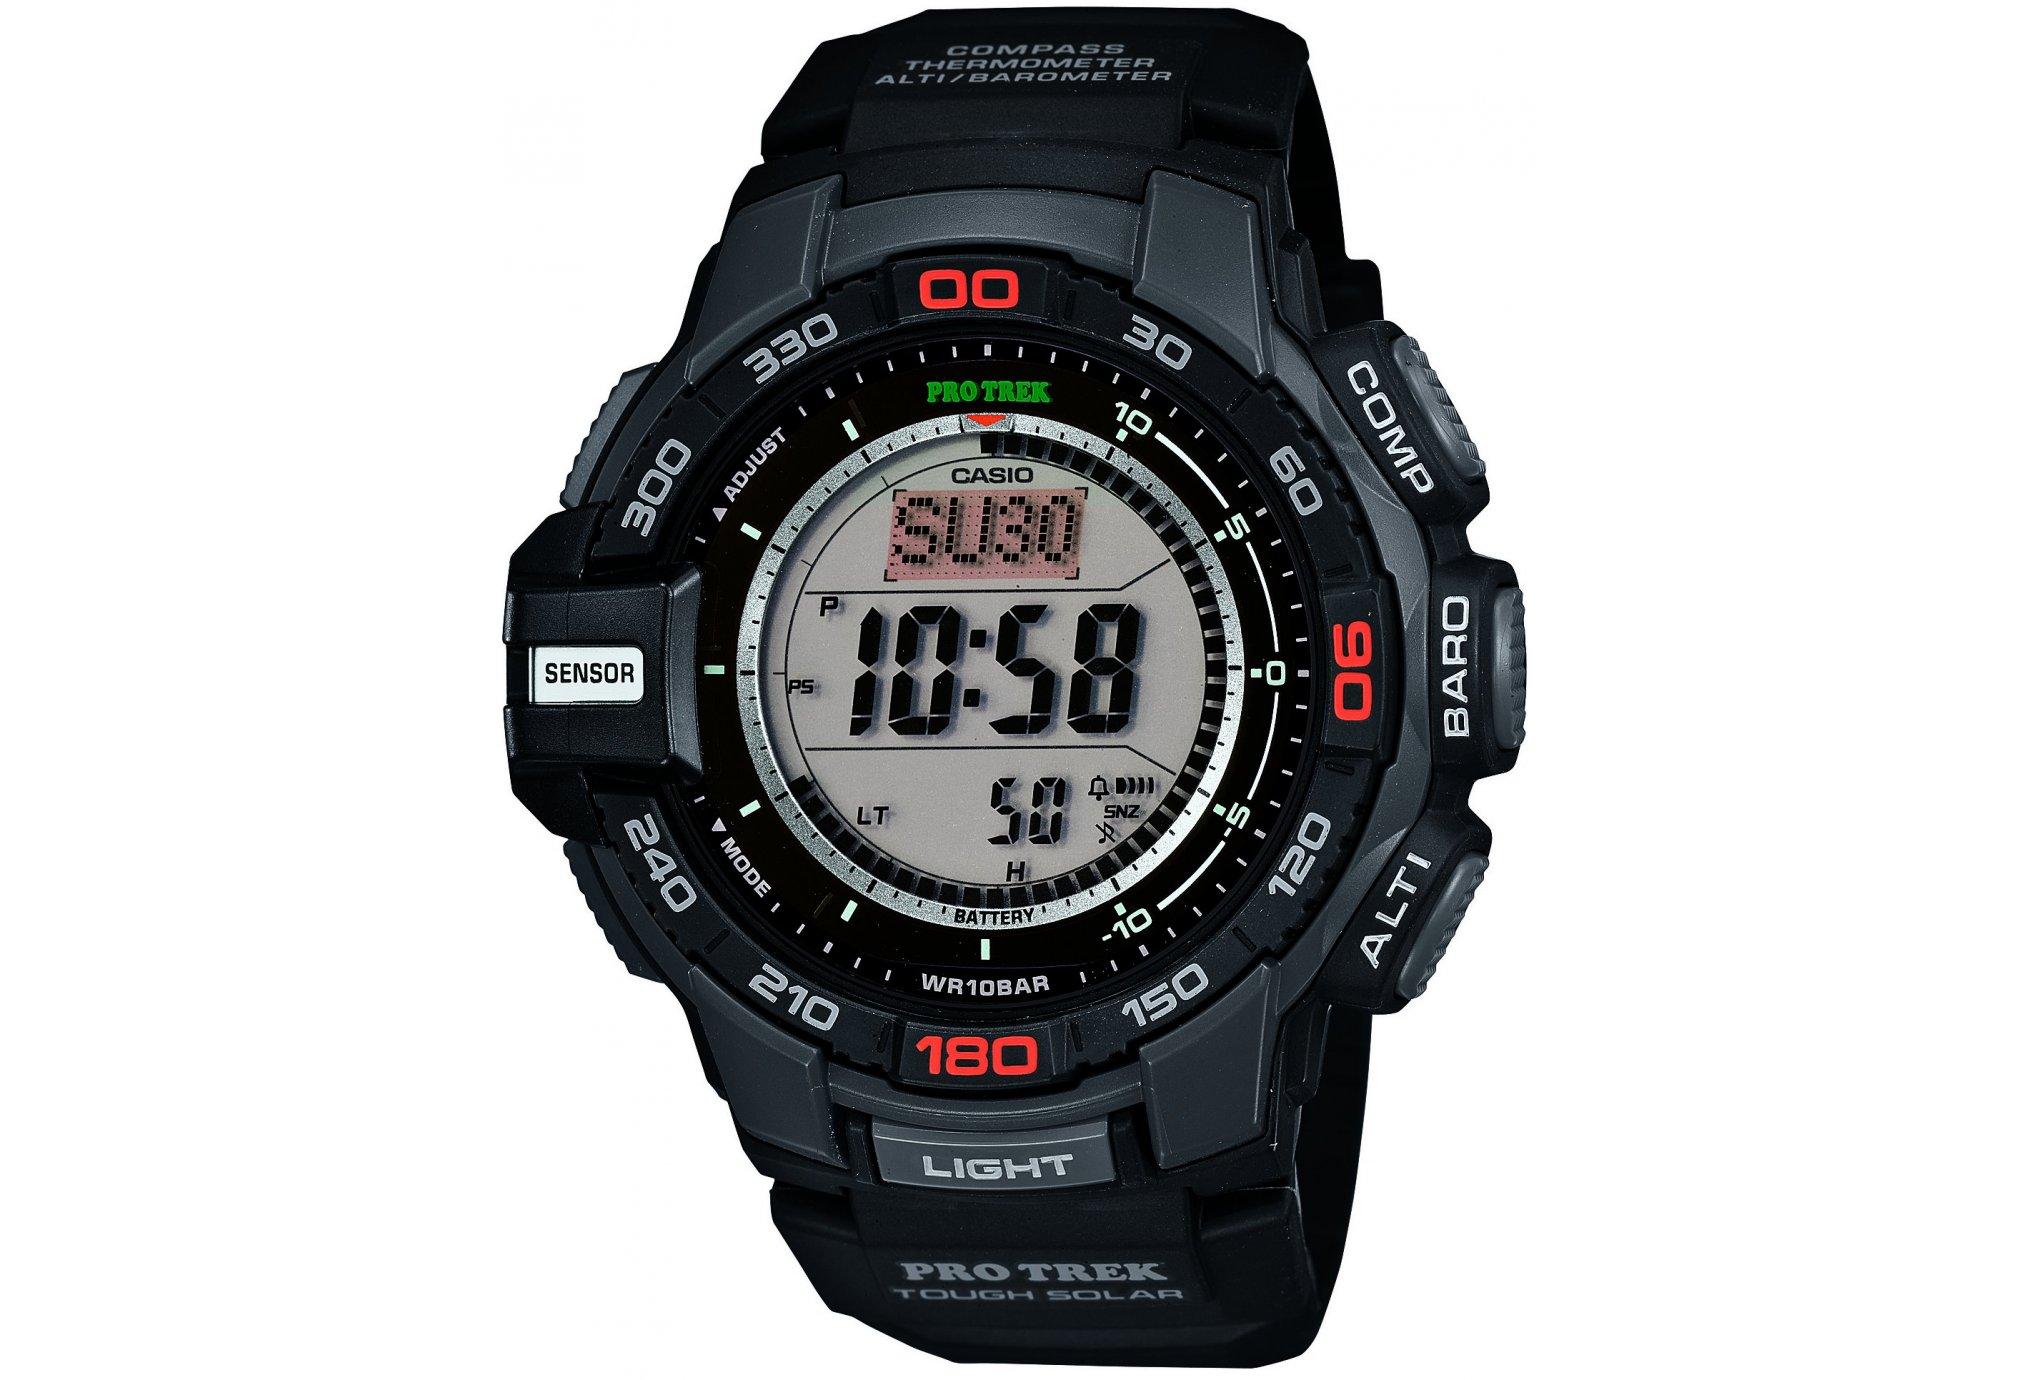 Casio Prg-270 montres de sport